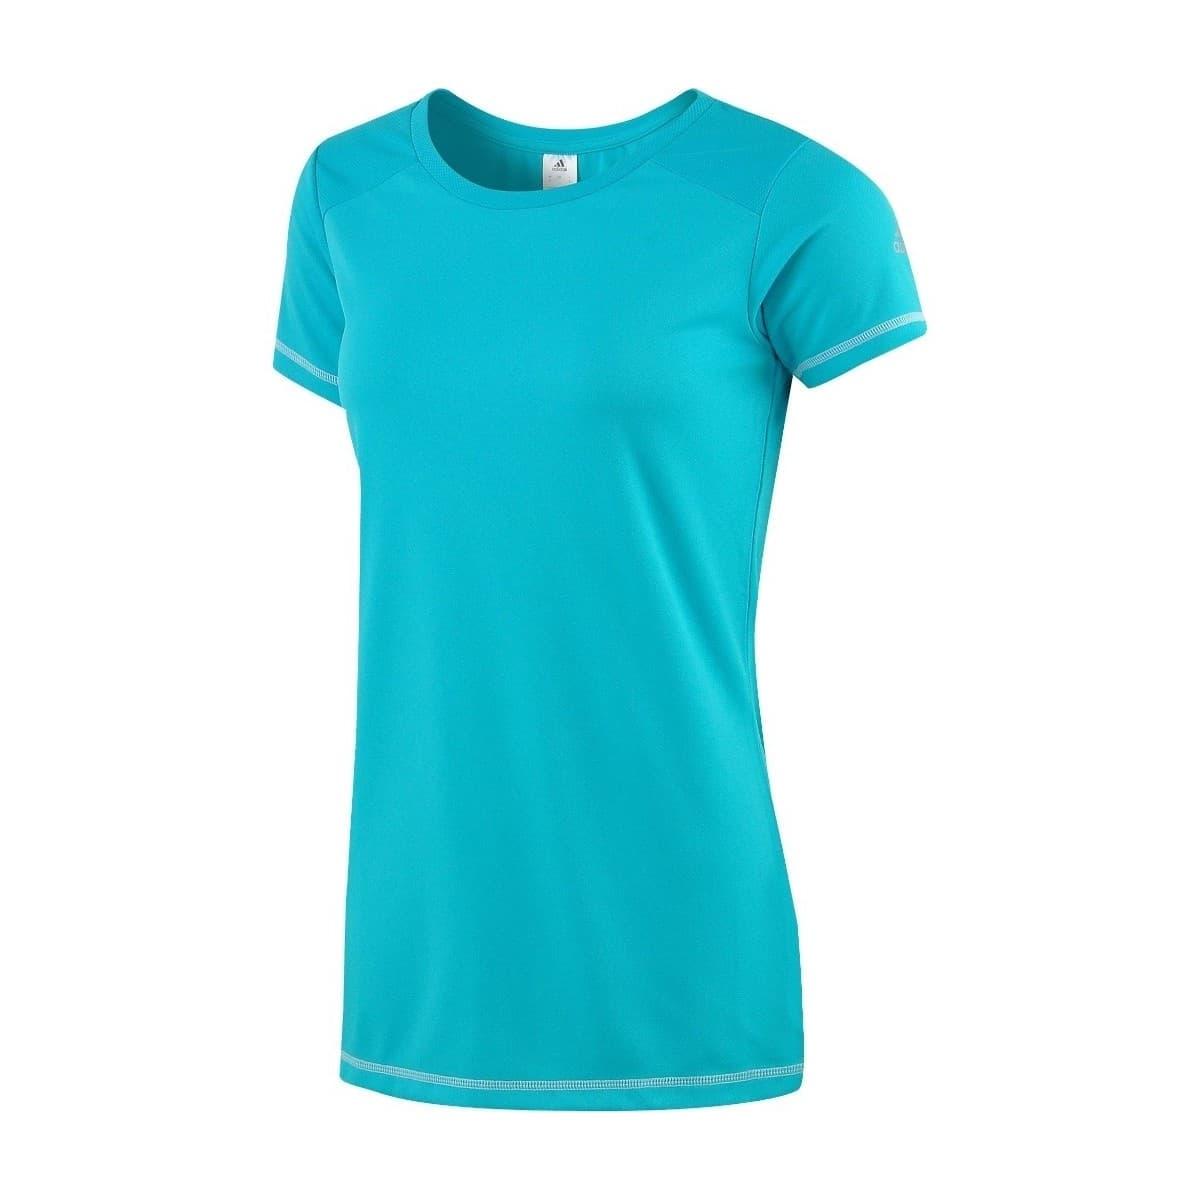 adidas Fleur Kadın Mavi Spor Tişört (AJ3920)